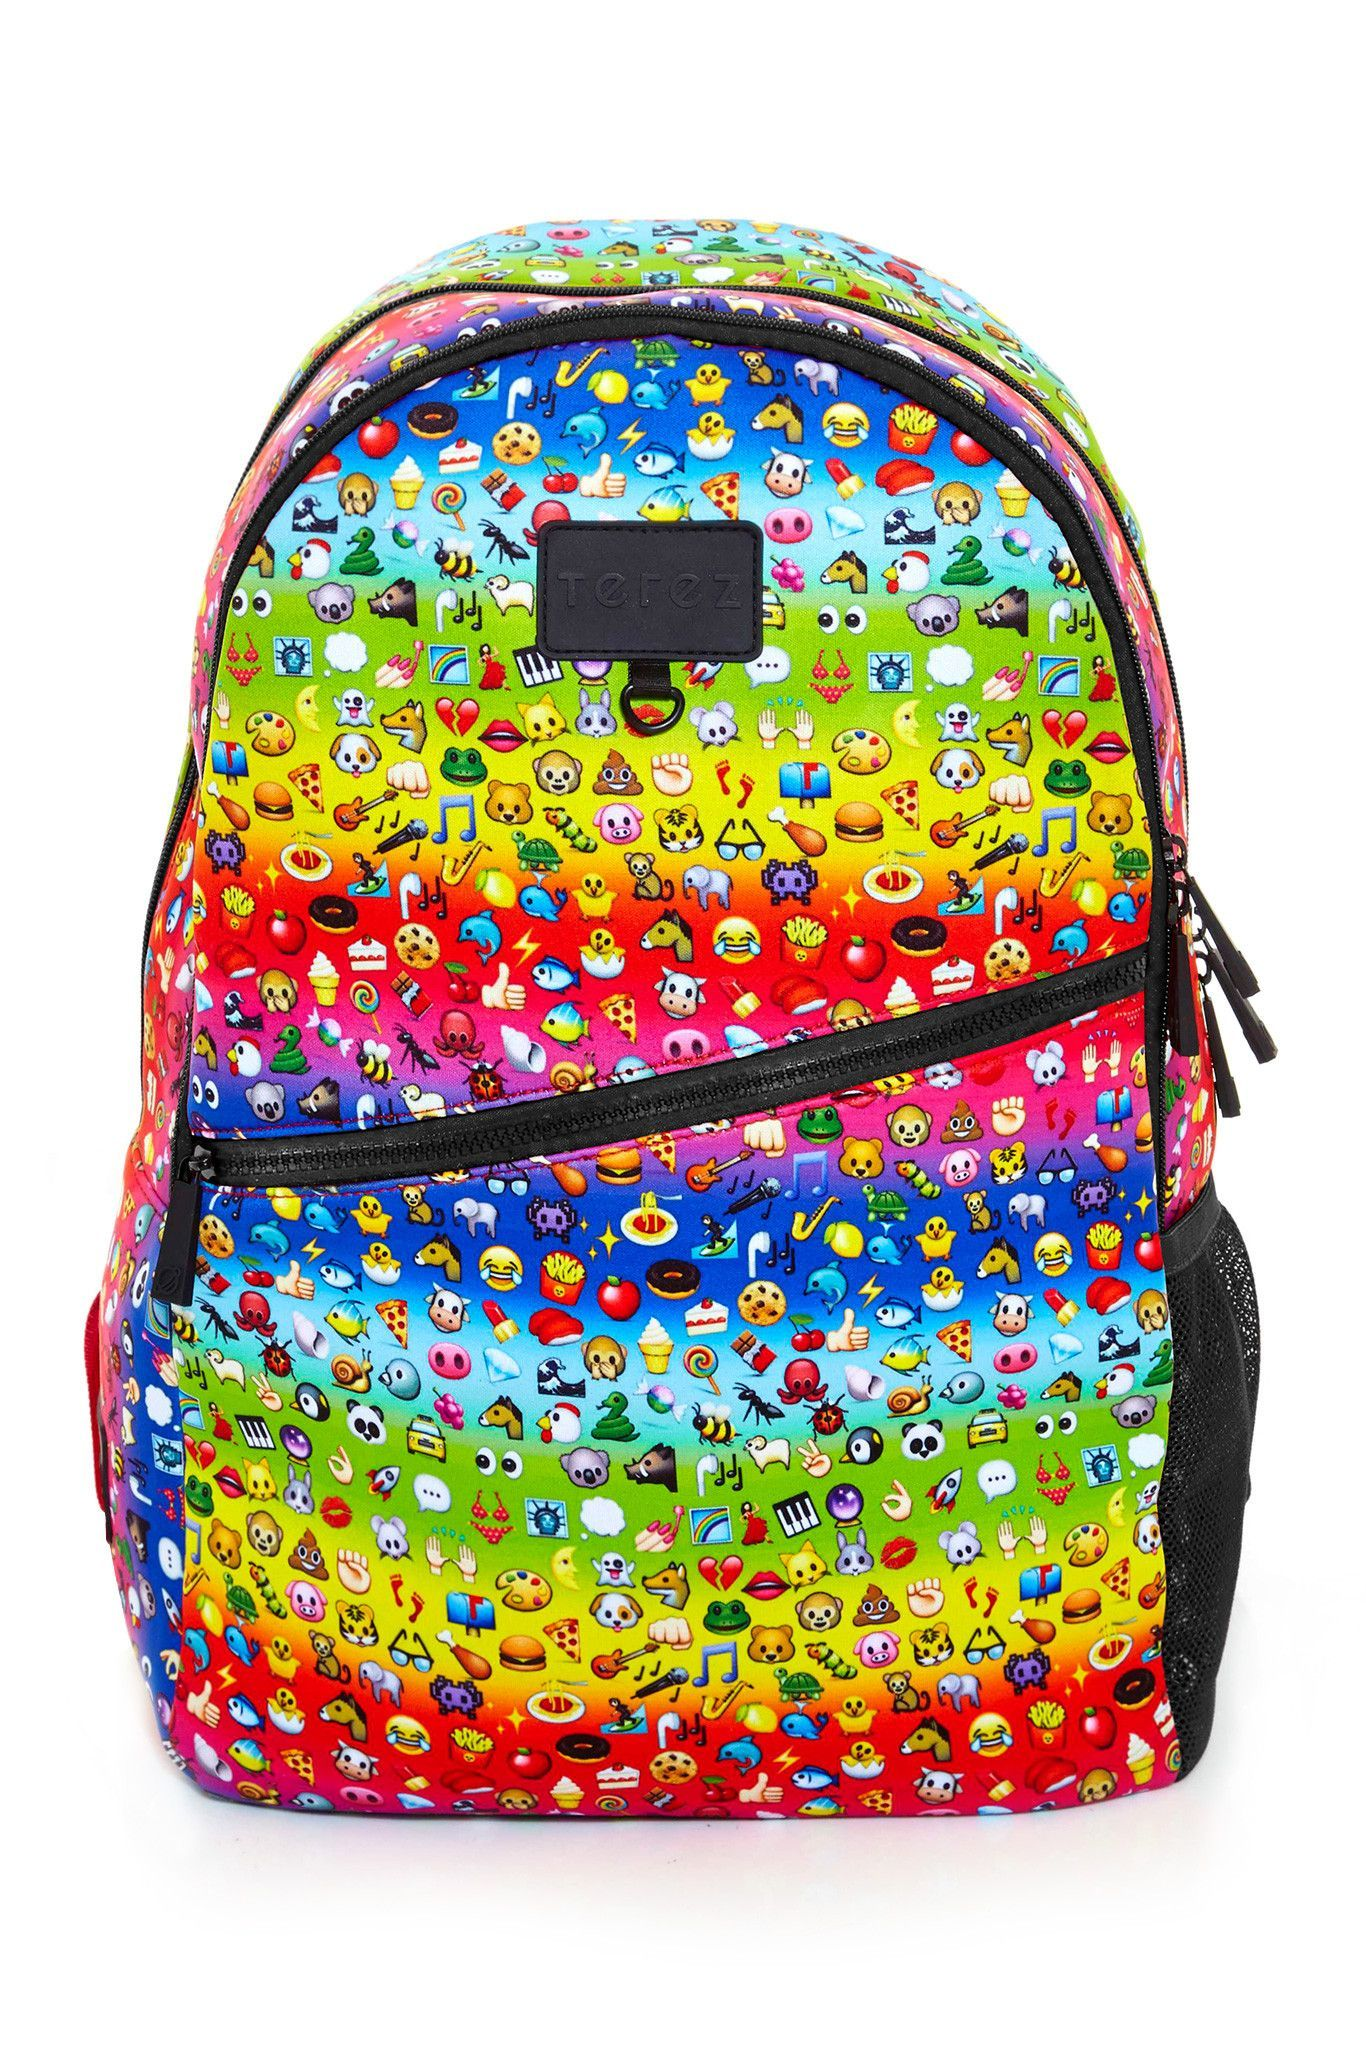 ead8d57833 X Go!Sac Rainbow Emoji Backpack in 2019